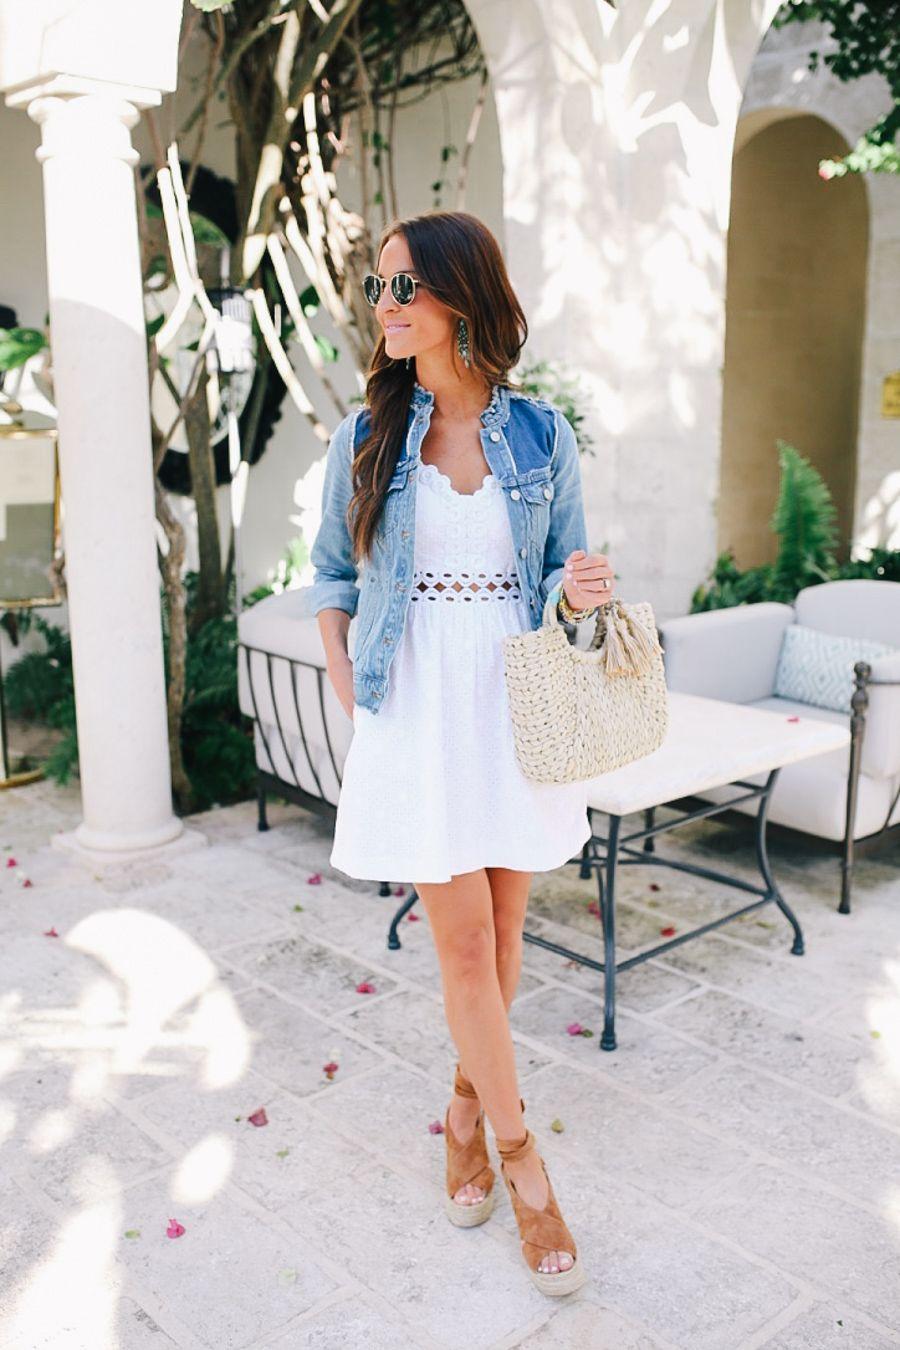 e4c2f3b8a3 the perfect little white dress